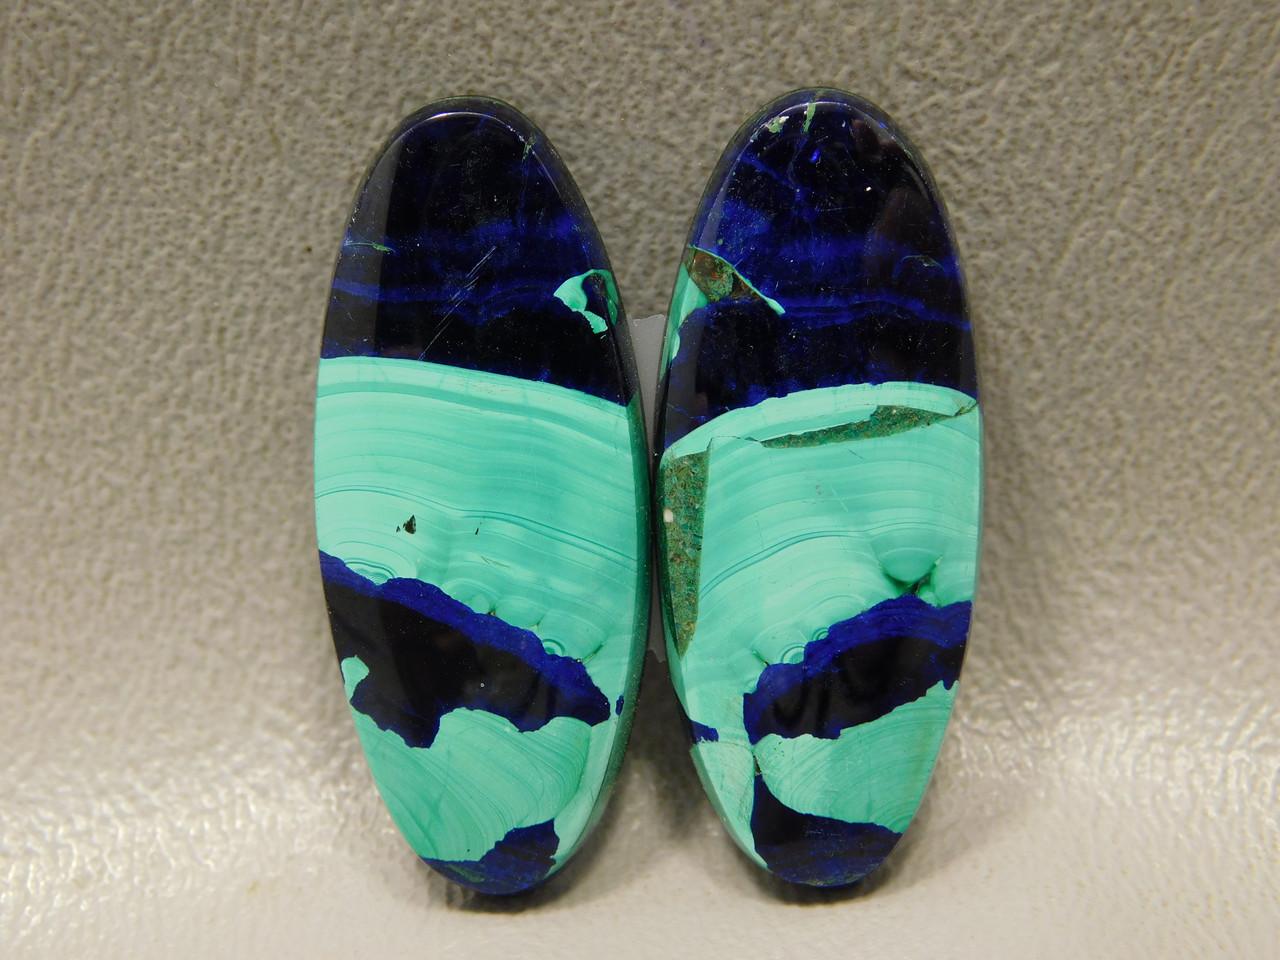 Designer Cabochons Azurite-Malachite Matched Pairs High Grade #12